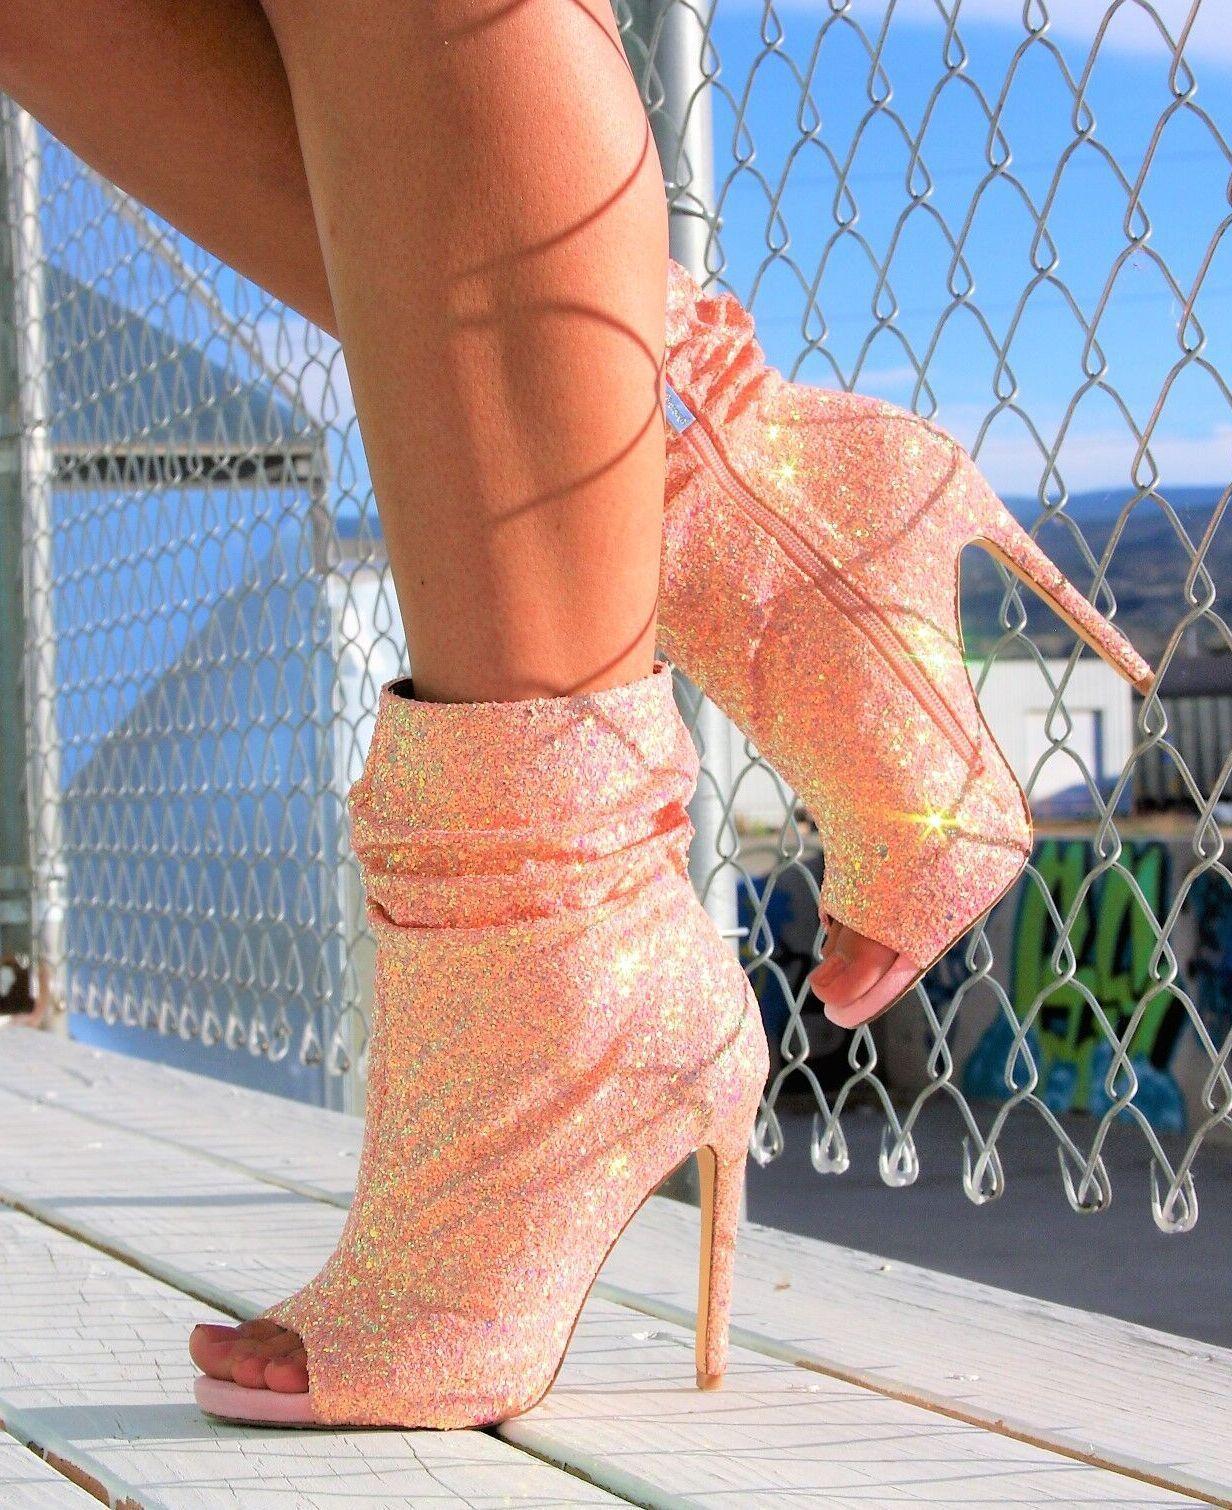 Nelly B Bernal Restocked Spotlight Ankle Stivali Heels High Heels Stivali Pink Glitter bbf16b